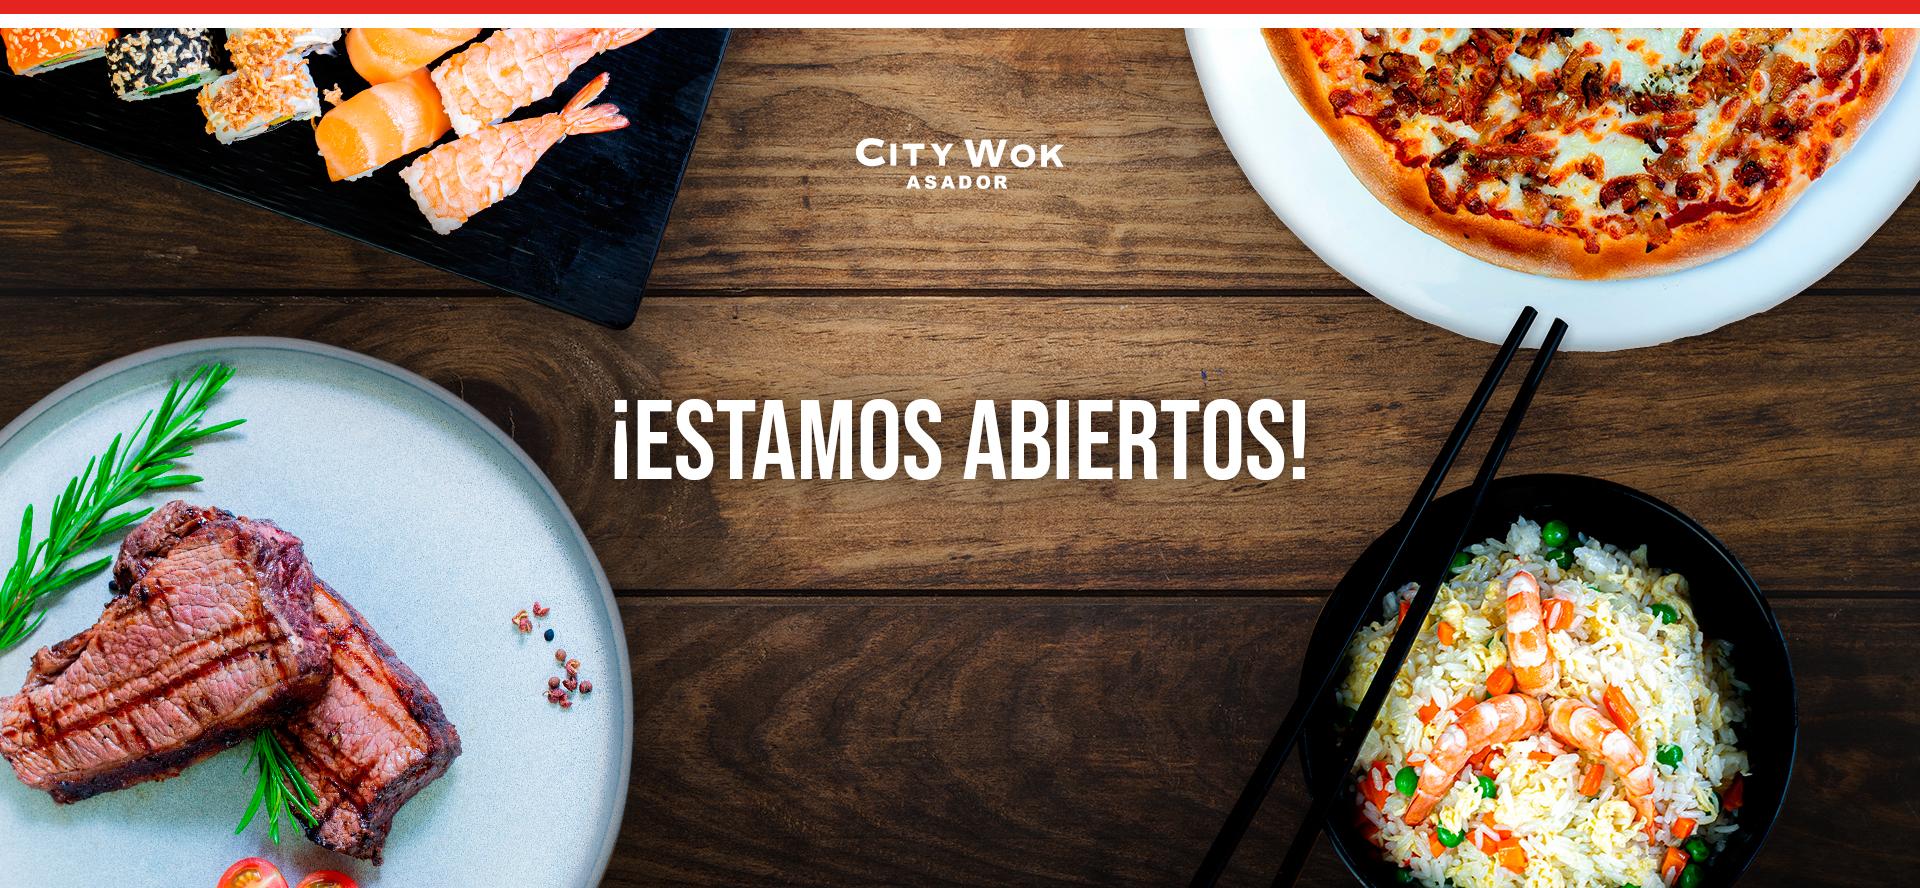 Abierto city wok